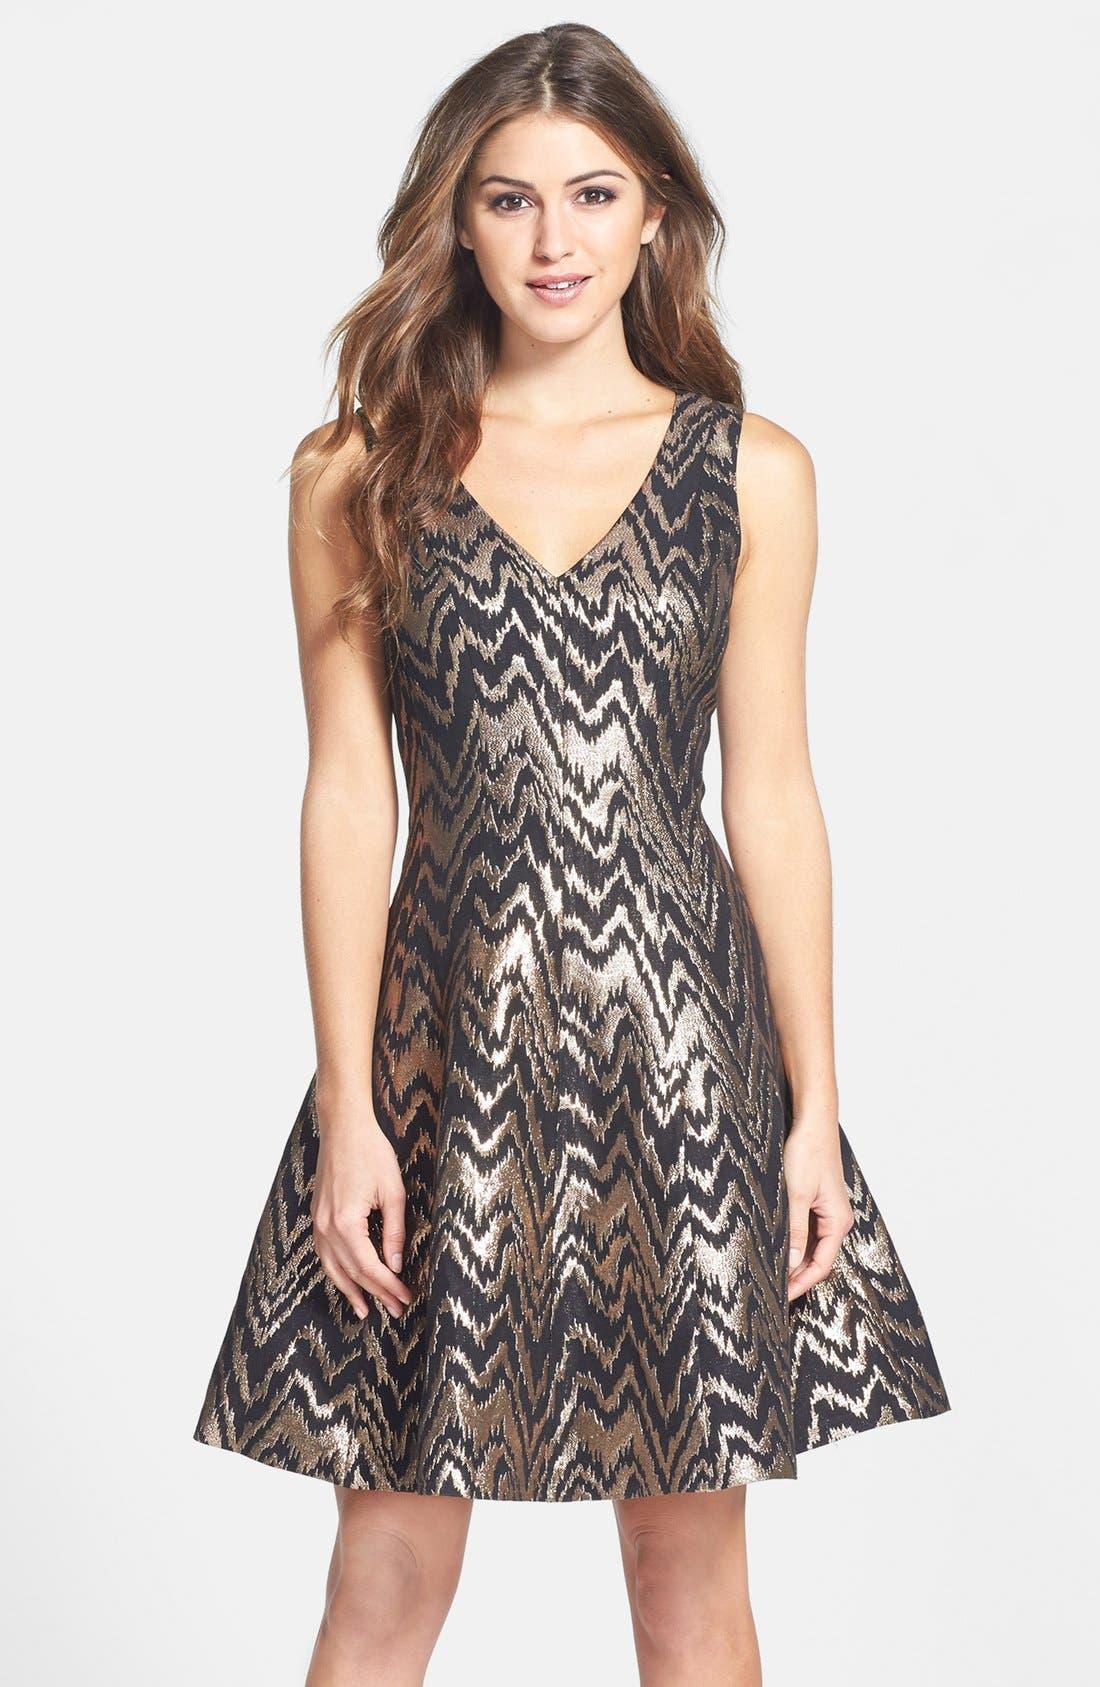 VINCE CAMUTO Metallic Jacquard Fit & Flare Dress, Main, color, 226